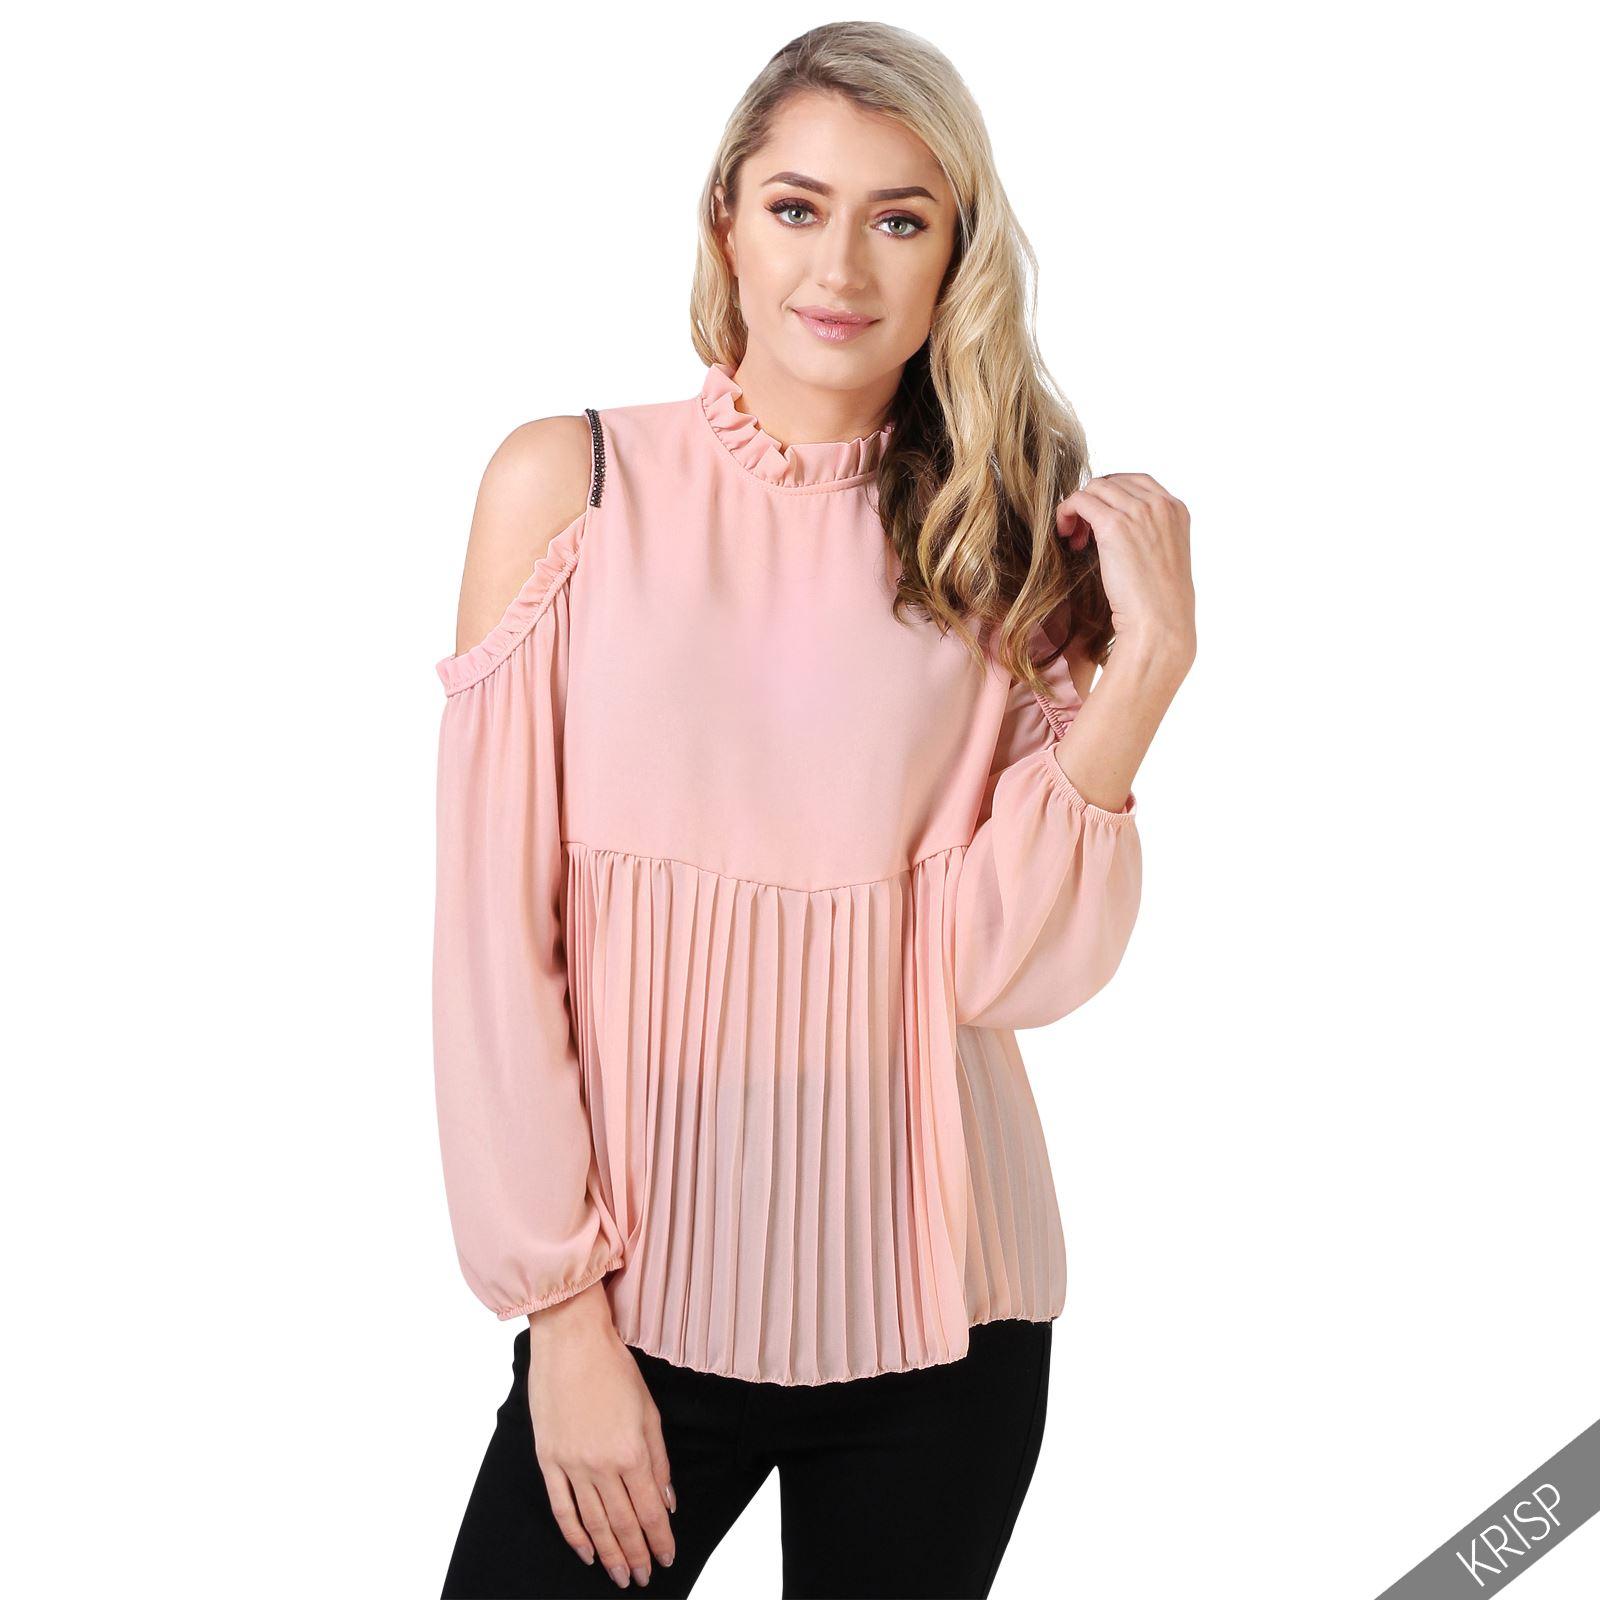 Original Womens Ladies Disco Ruffle Frill Mesh Bell Long Sleeve Pleatead Blouse Top 4-10 | EBay